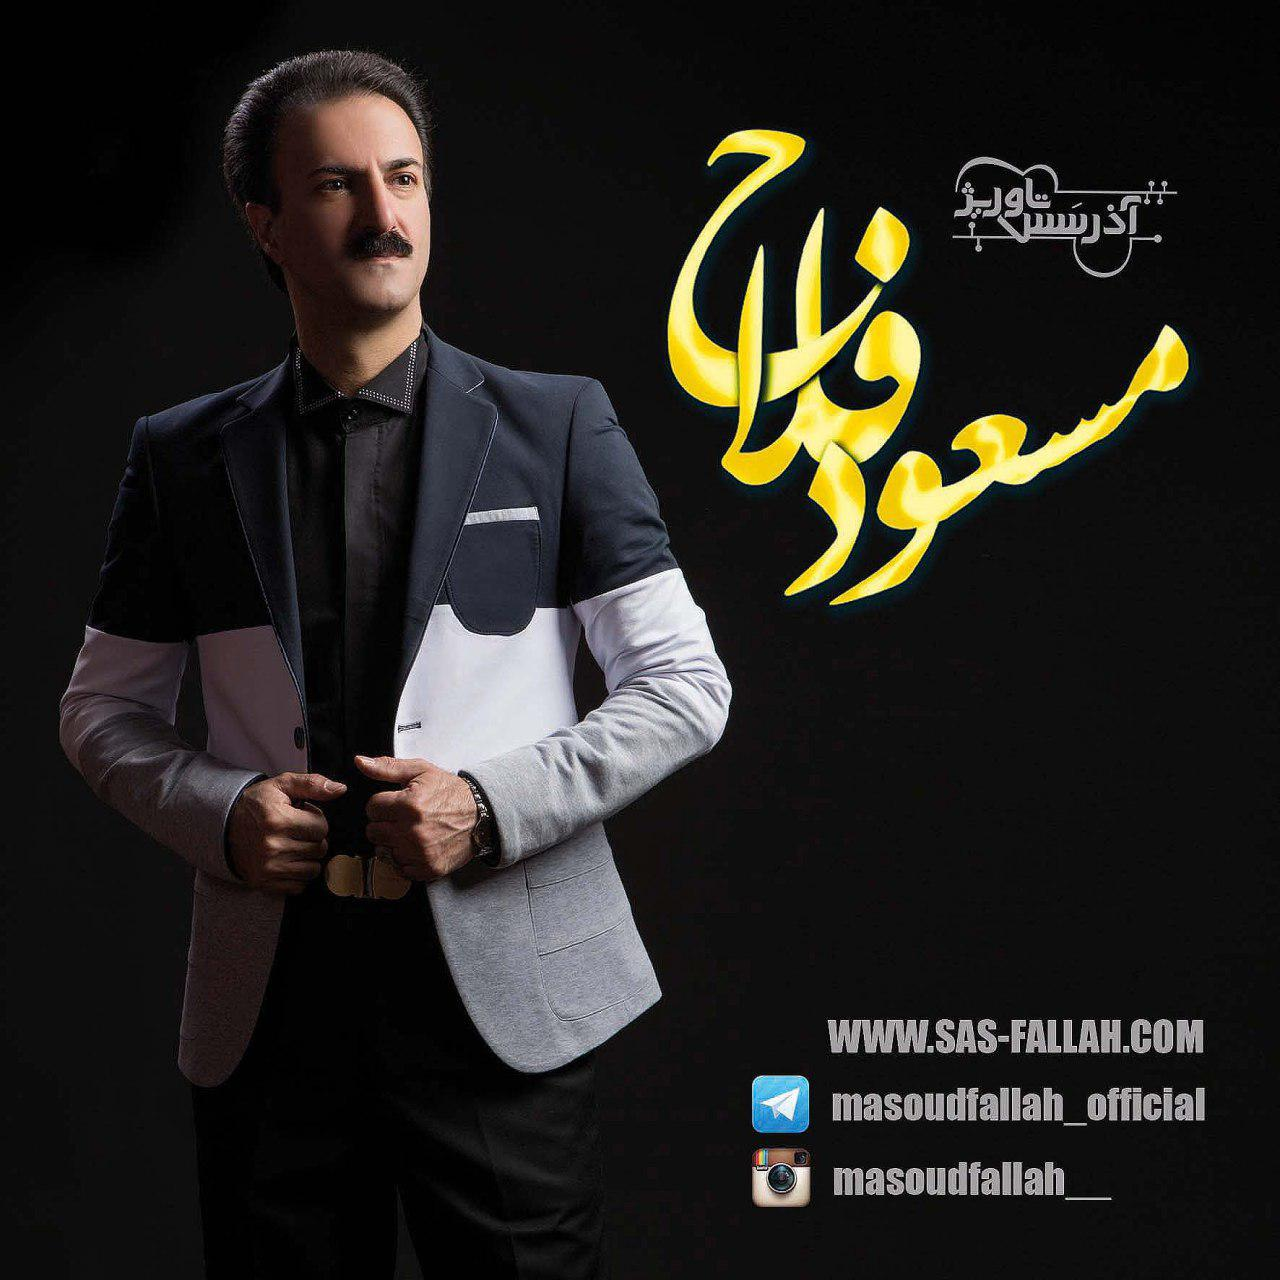 http://s9.picofile.com/file/8303727600/02Masoud_Fallah_Can_Yoldashim.jpg